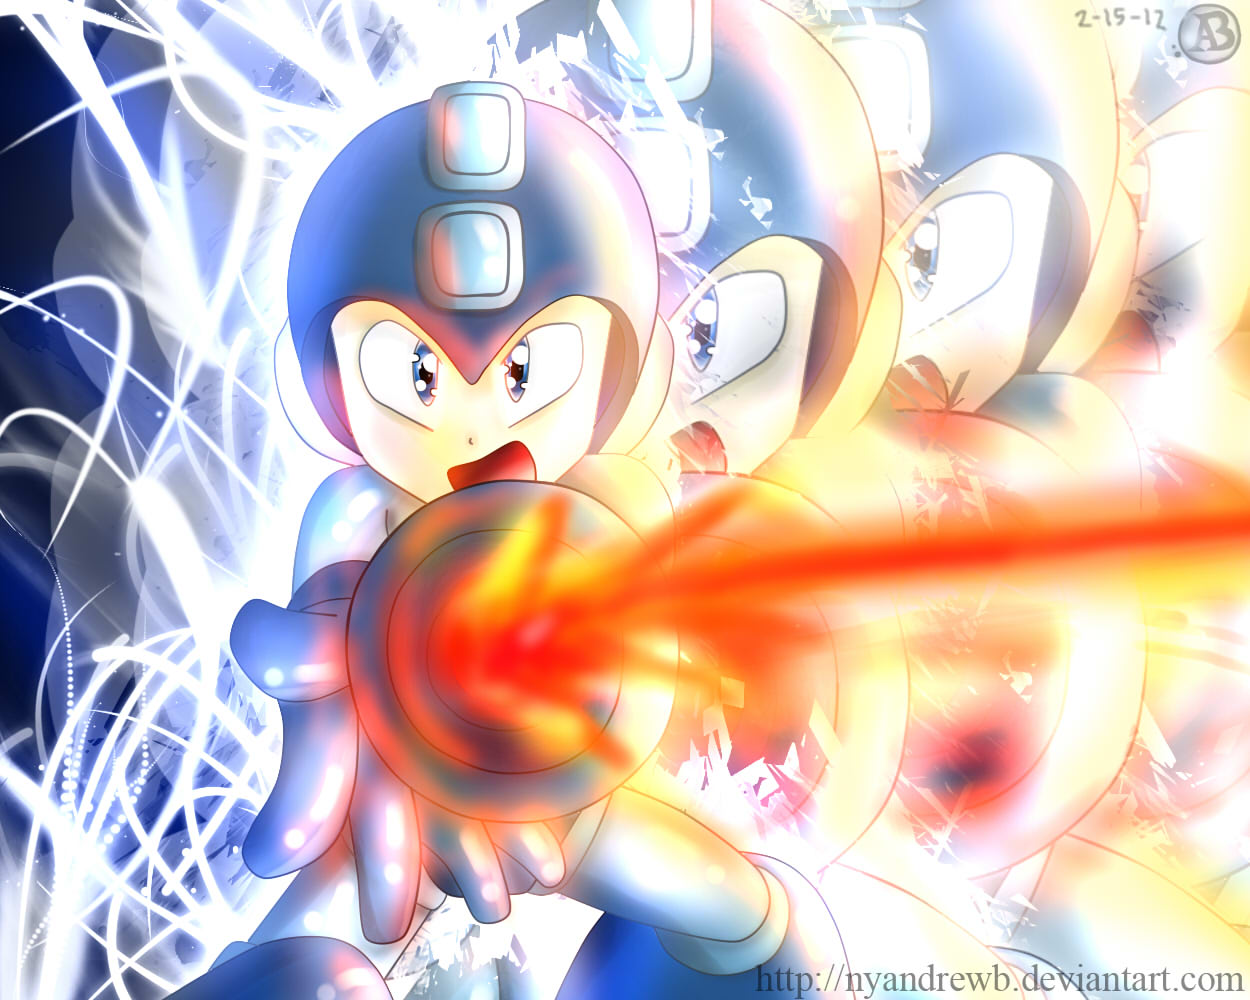 Megaman by NyandrewB